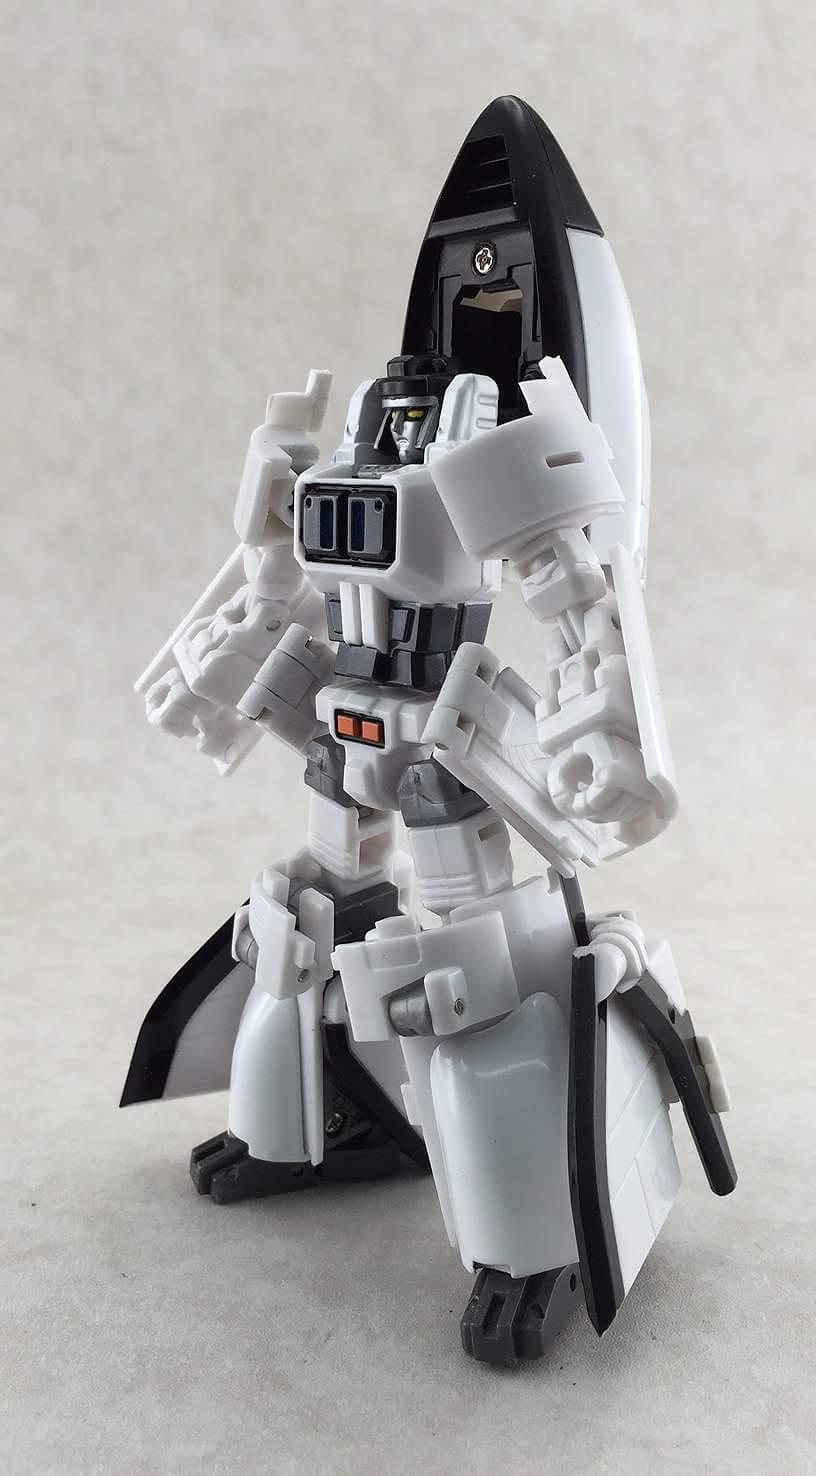 Gobots - Machine Robo ― Dessin Animé + Jouets  - Page 5 SWdrG4OG